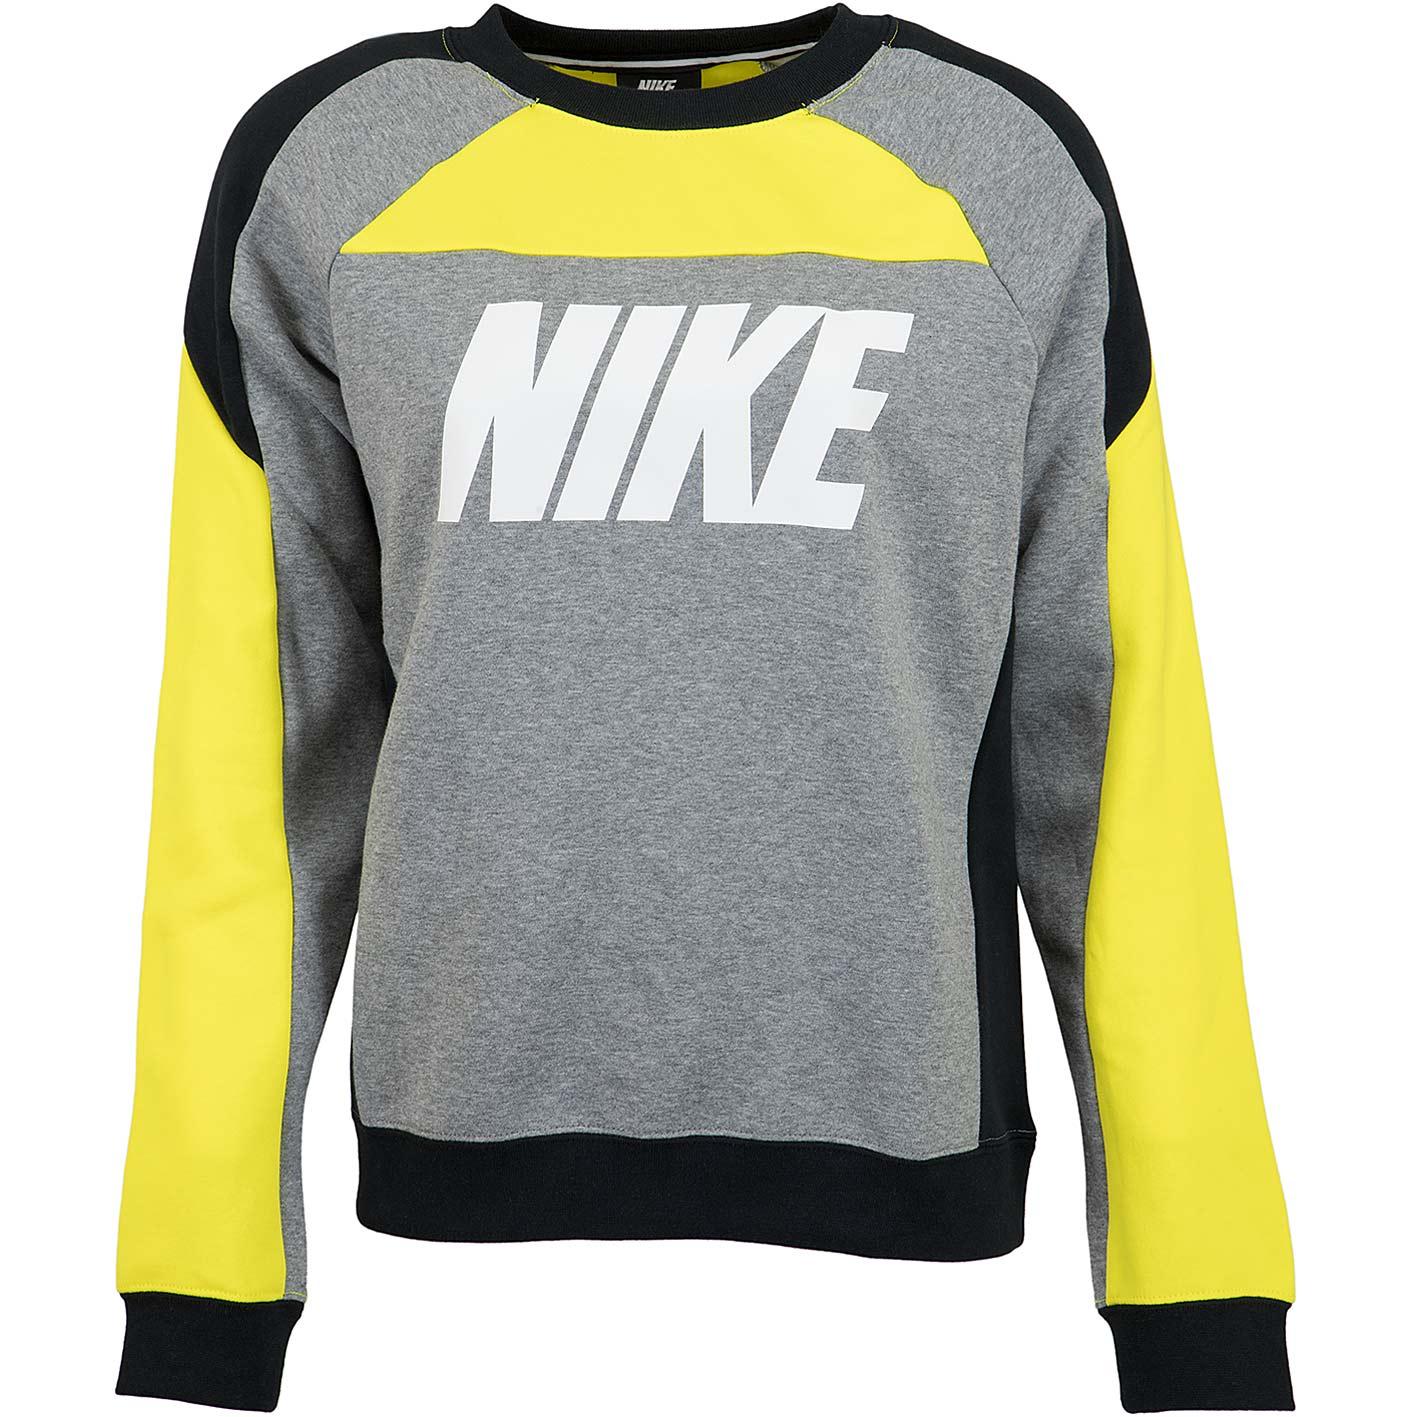 Nike Damen Sweatshirt CB Fleece gelbgrau